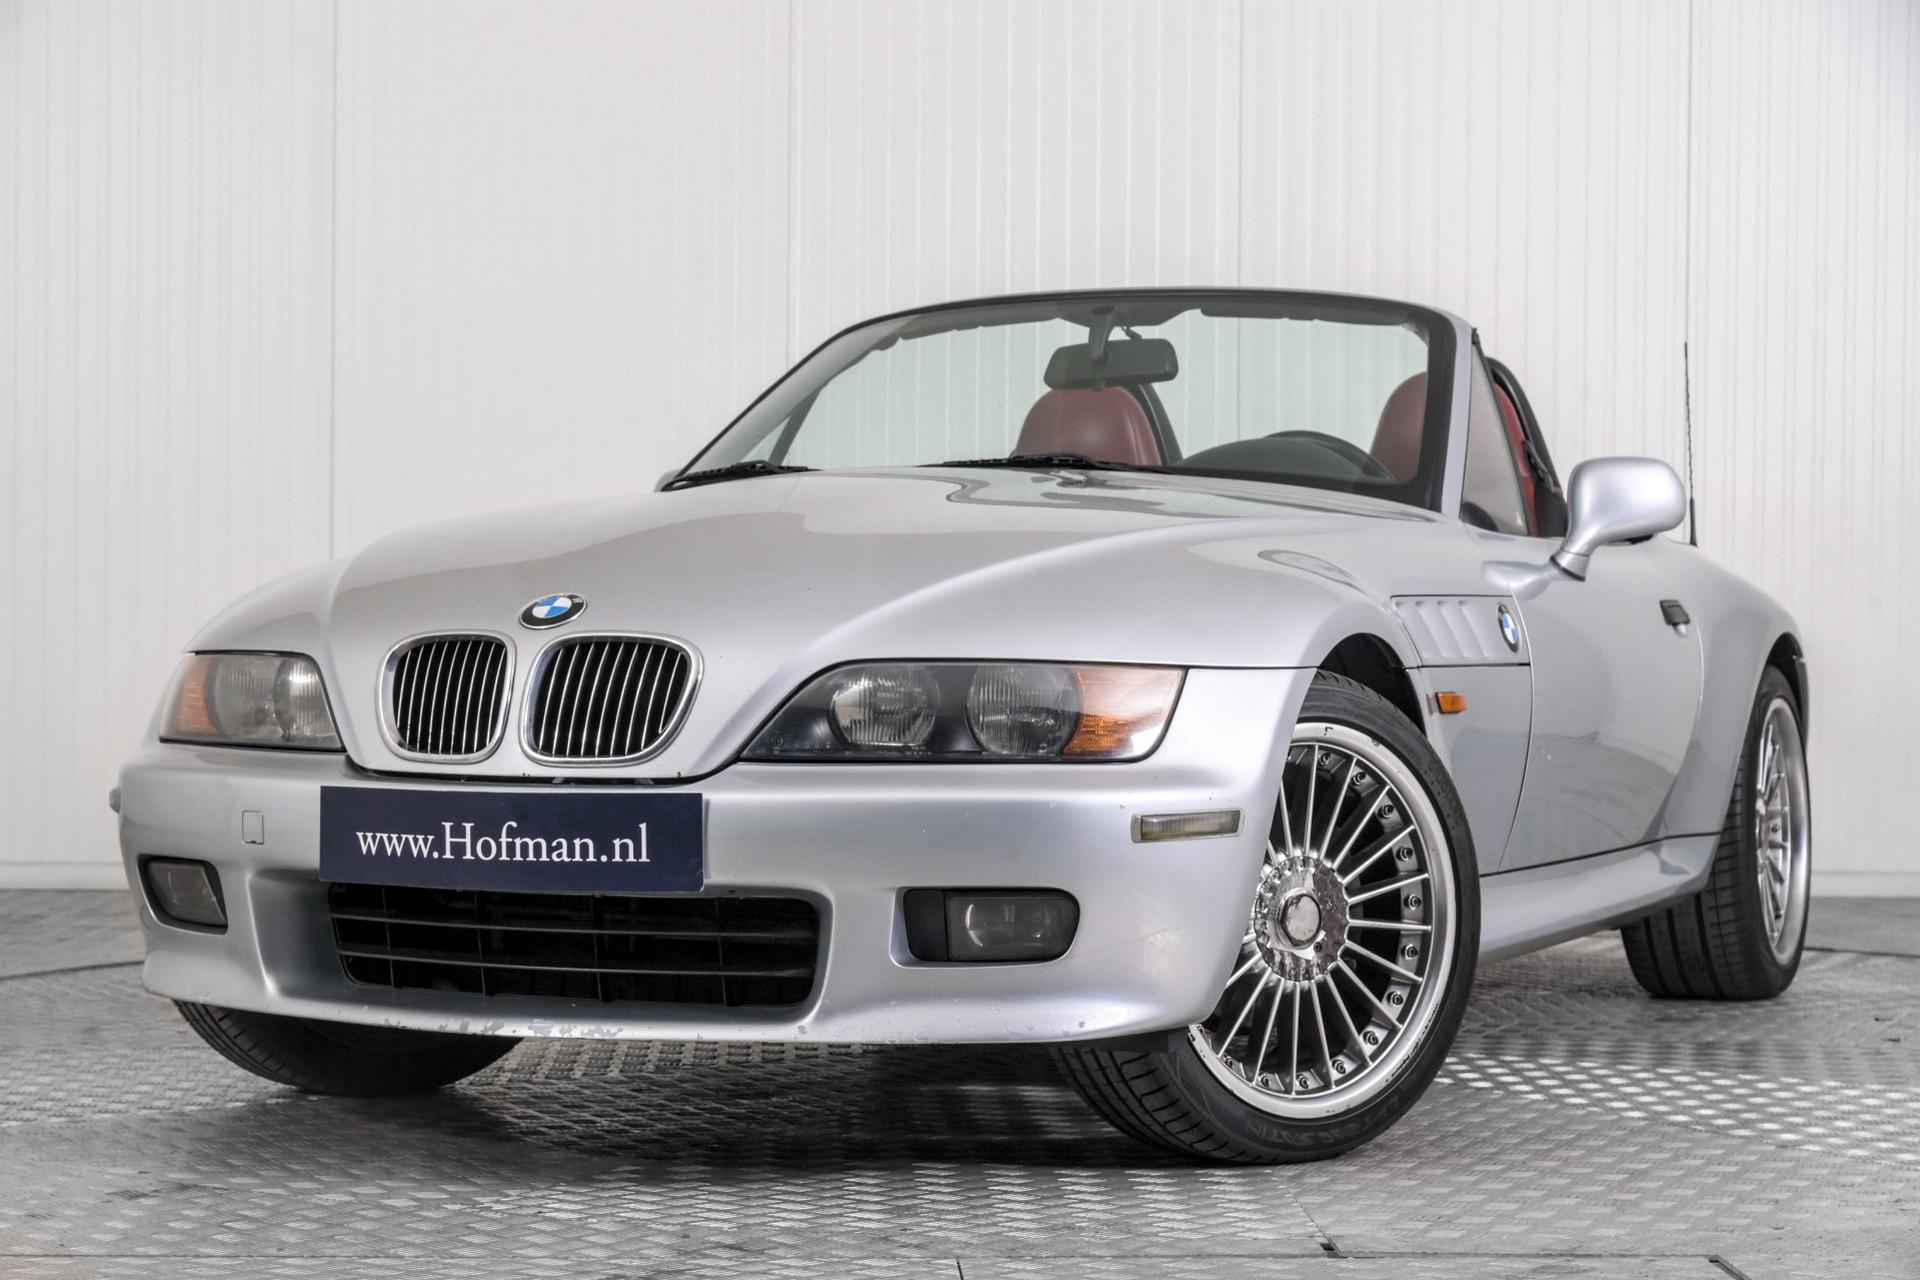 BMW Z3 Roadster 2.8 Foto 3